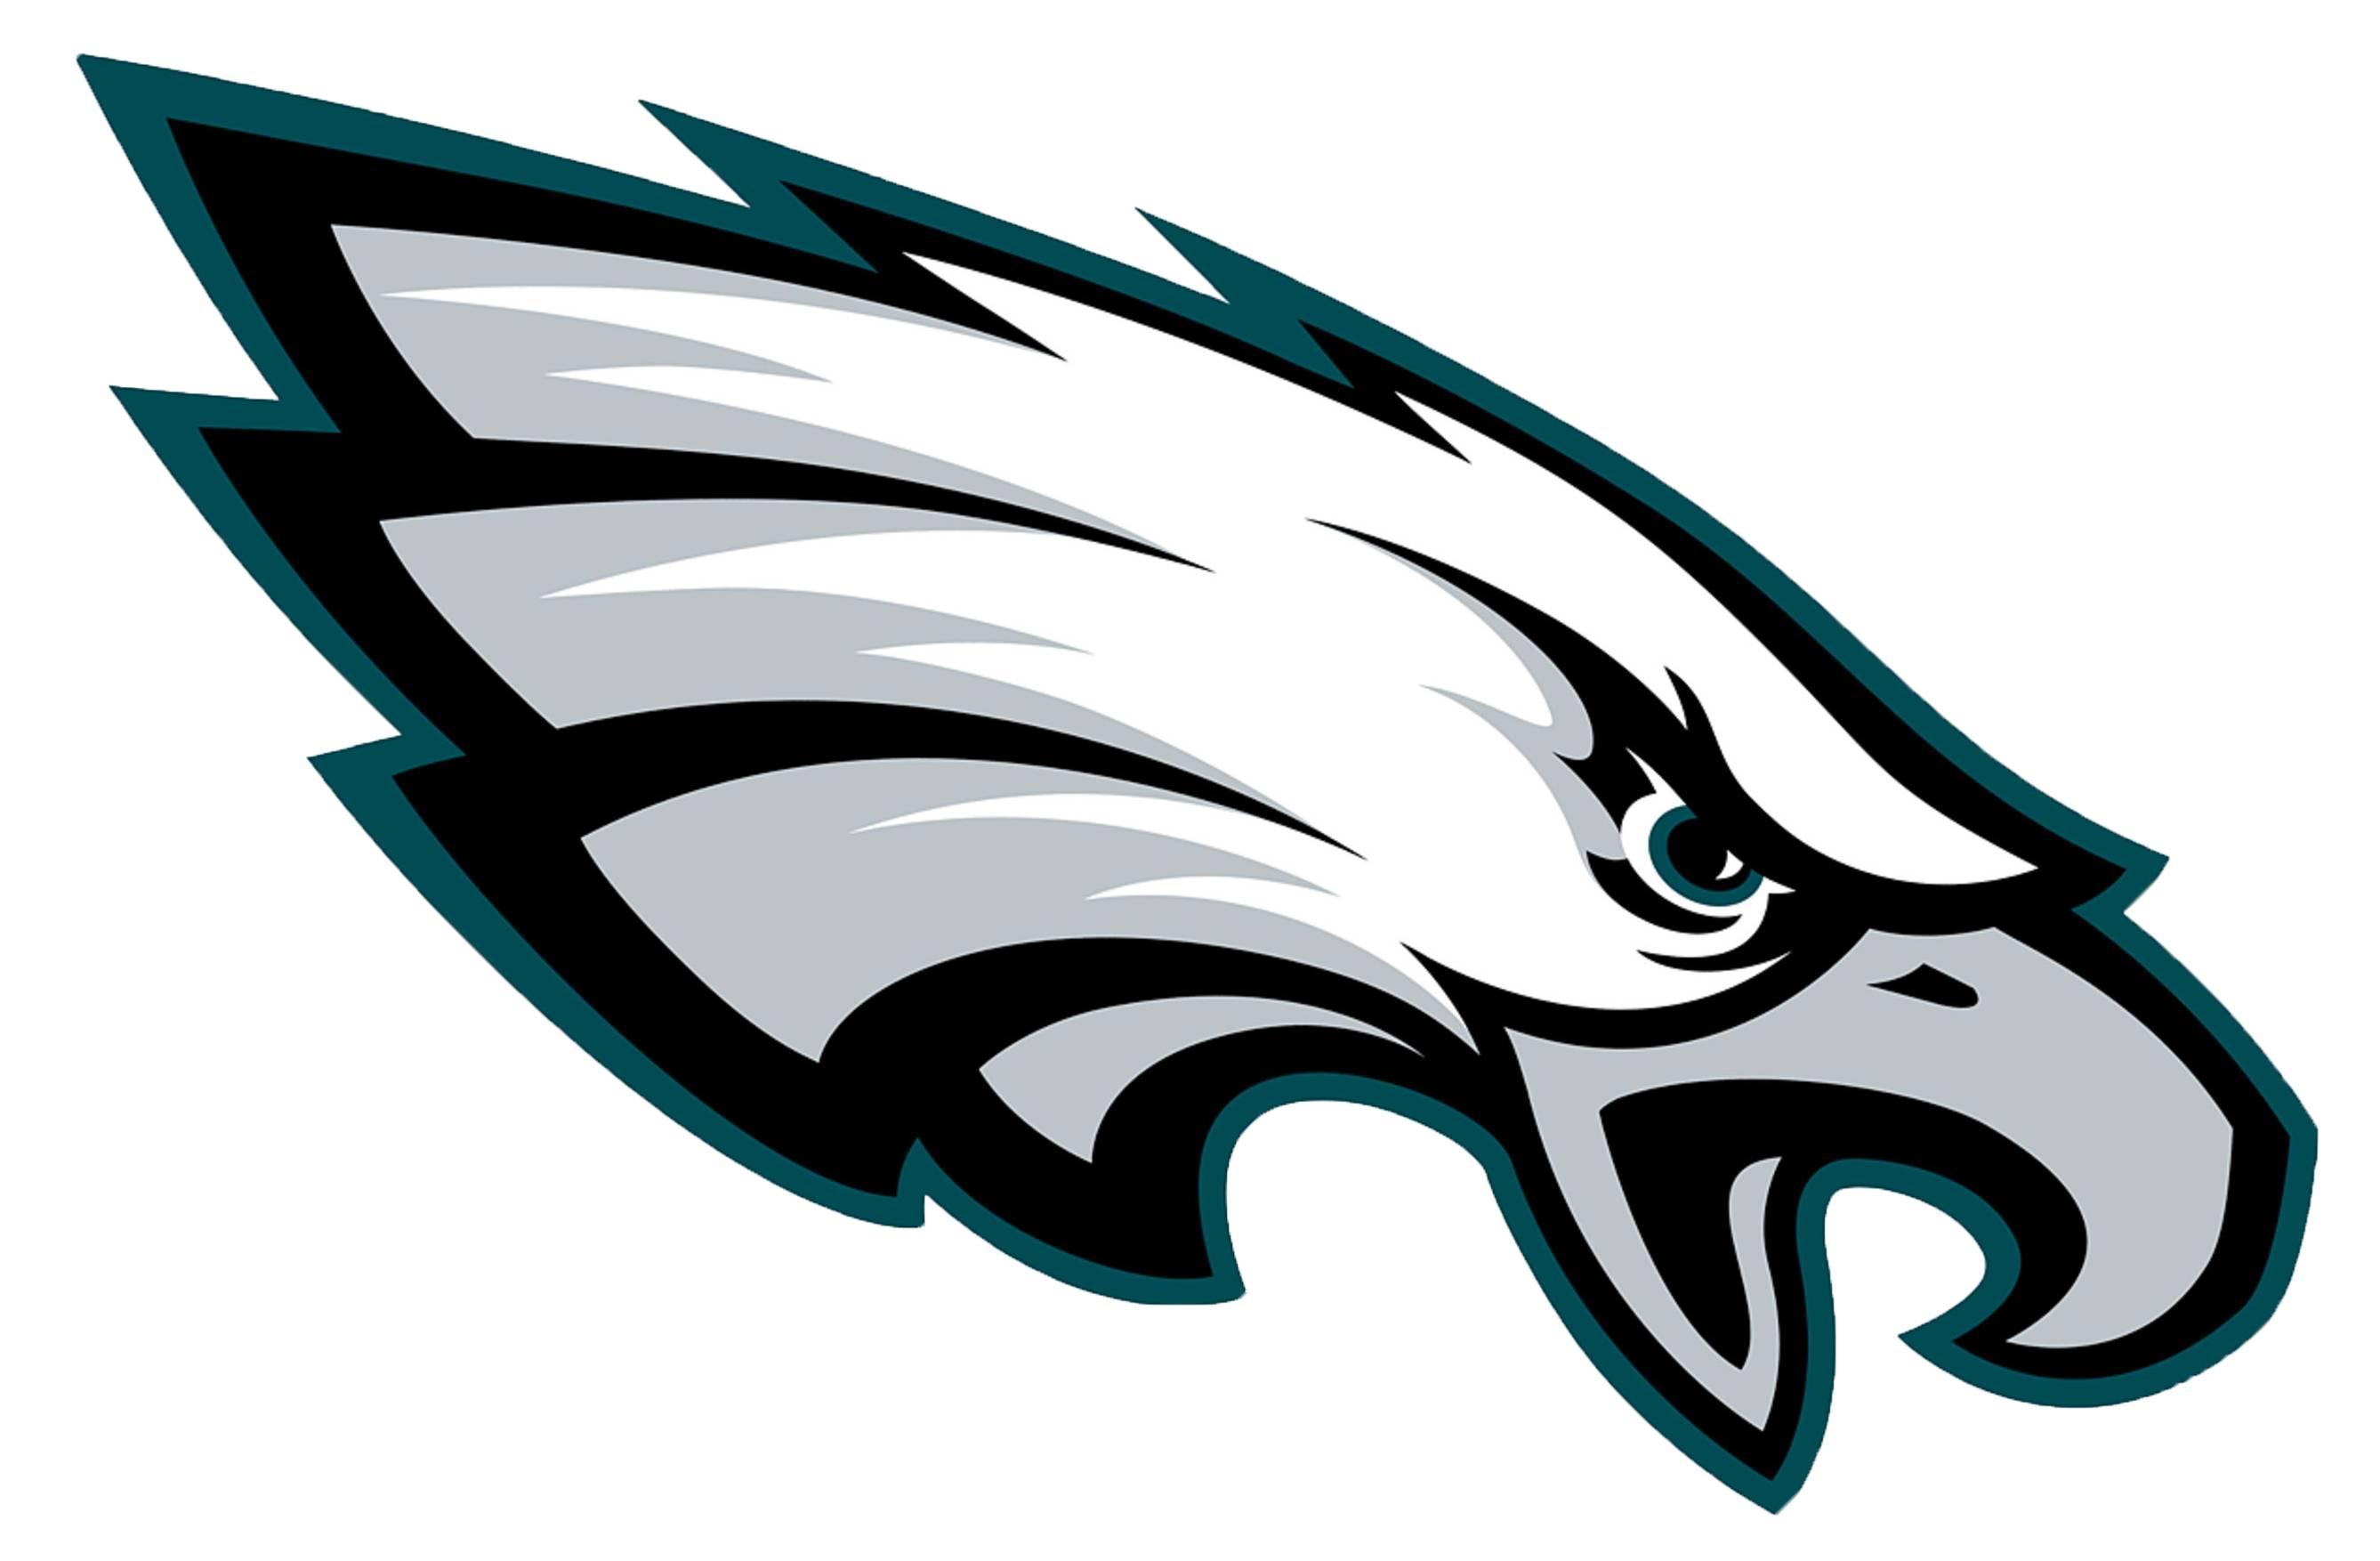 philadelphia eagles clipart at getdrawings com free for personal rh getdrawings com philadelphia eagles football clipart philadelphia eagles football clipart